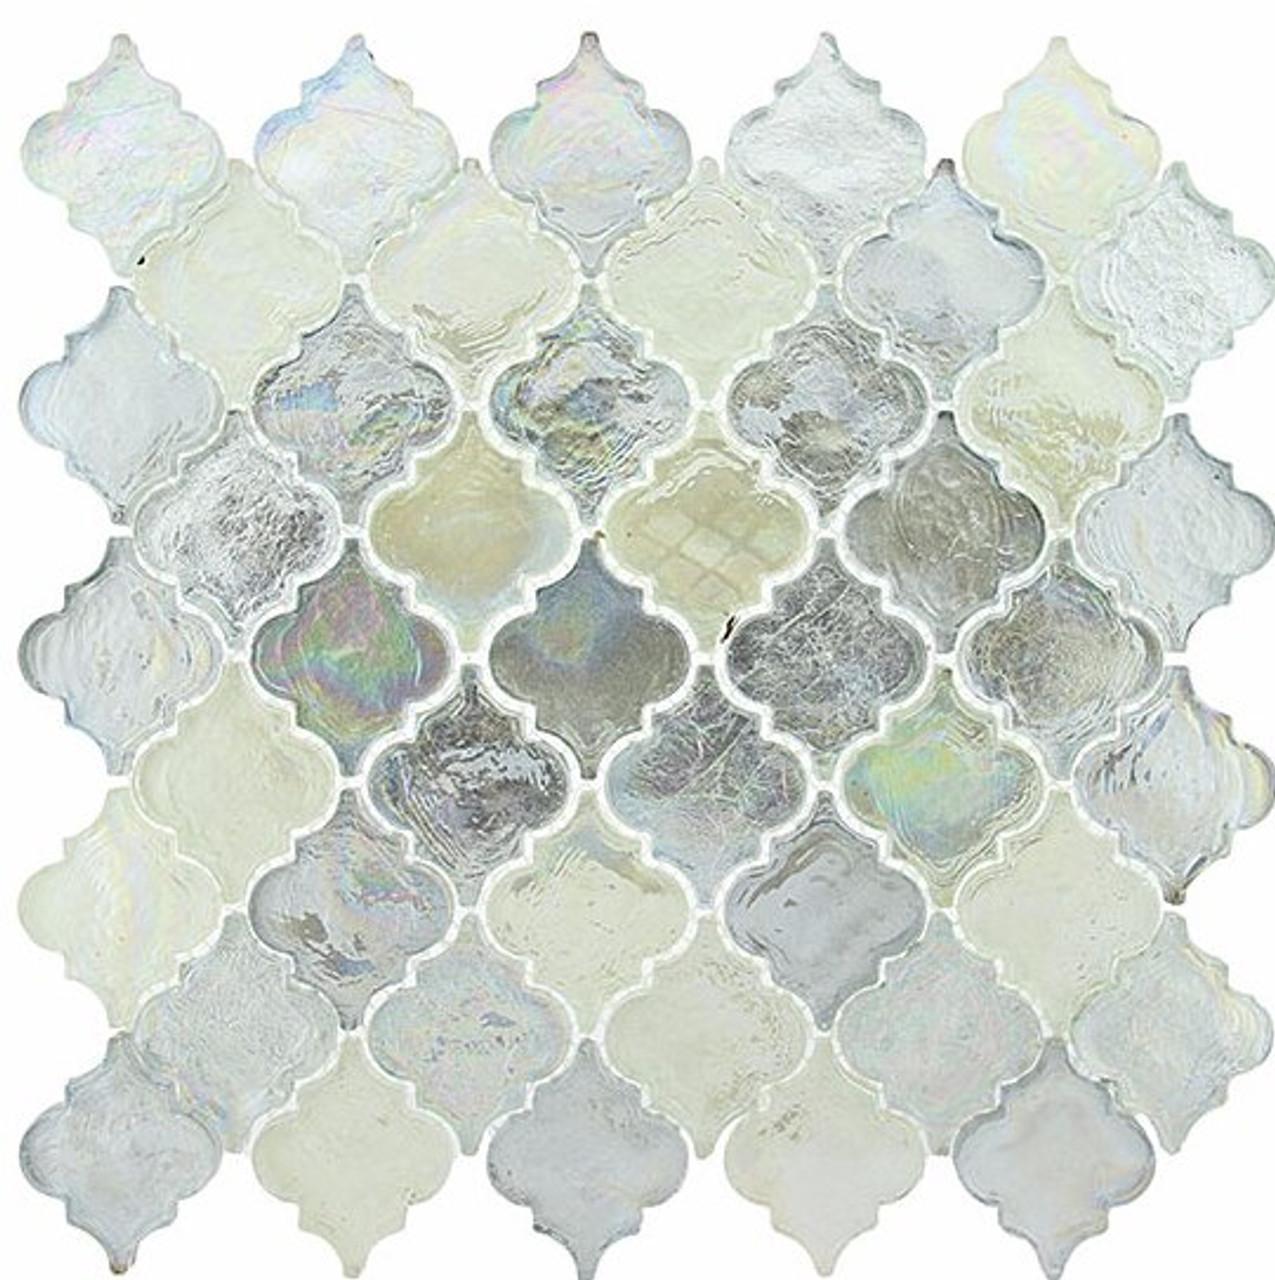 Bella Glass Tiles Dentelle Series April Shower Glass Mosaic DTL-3004